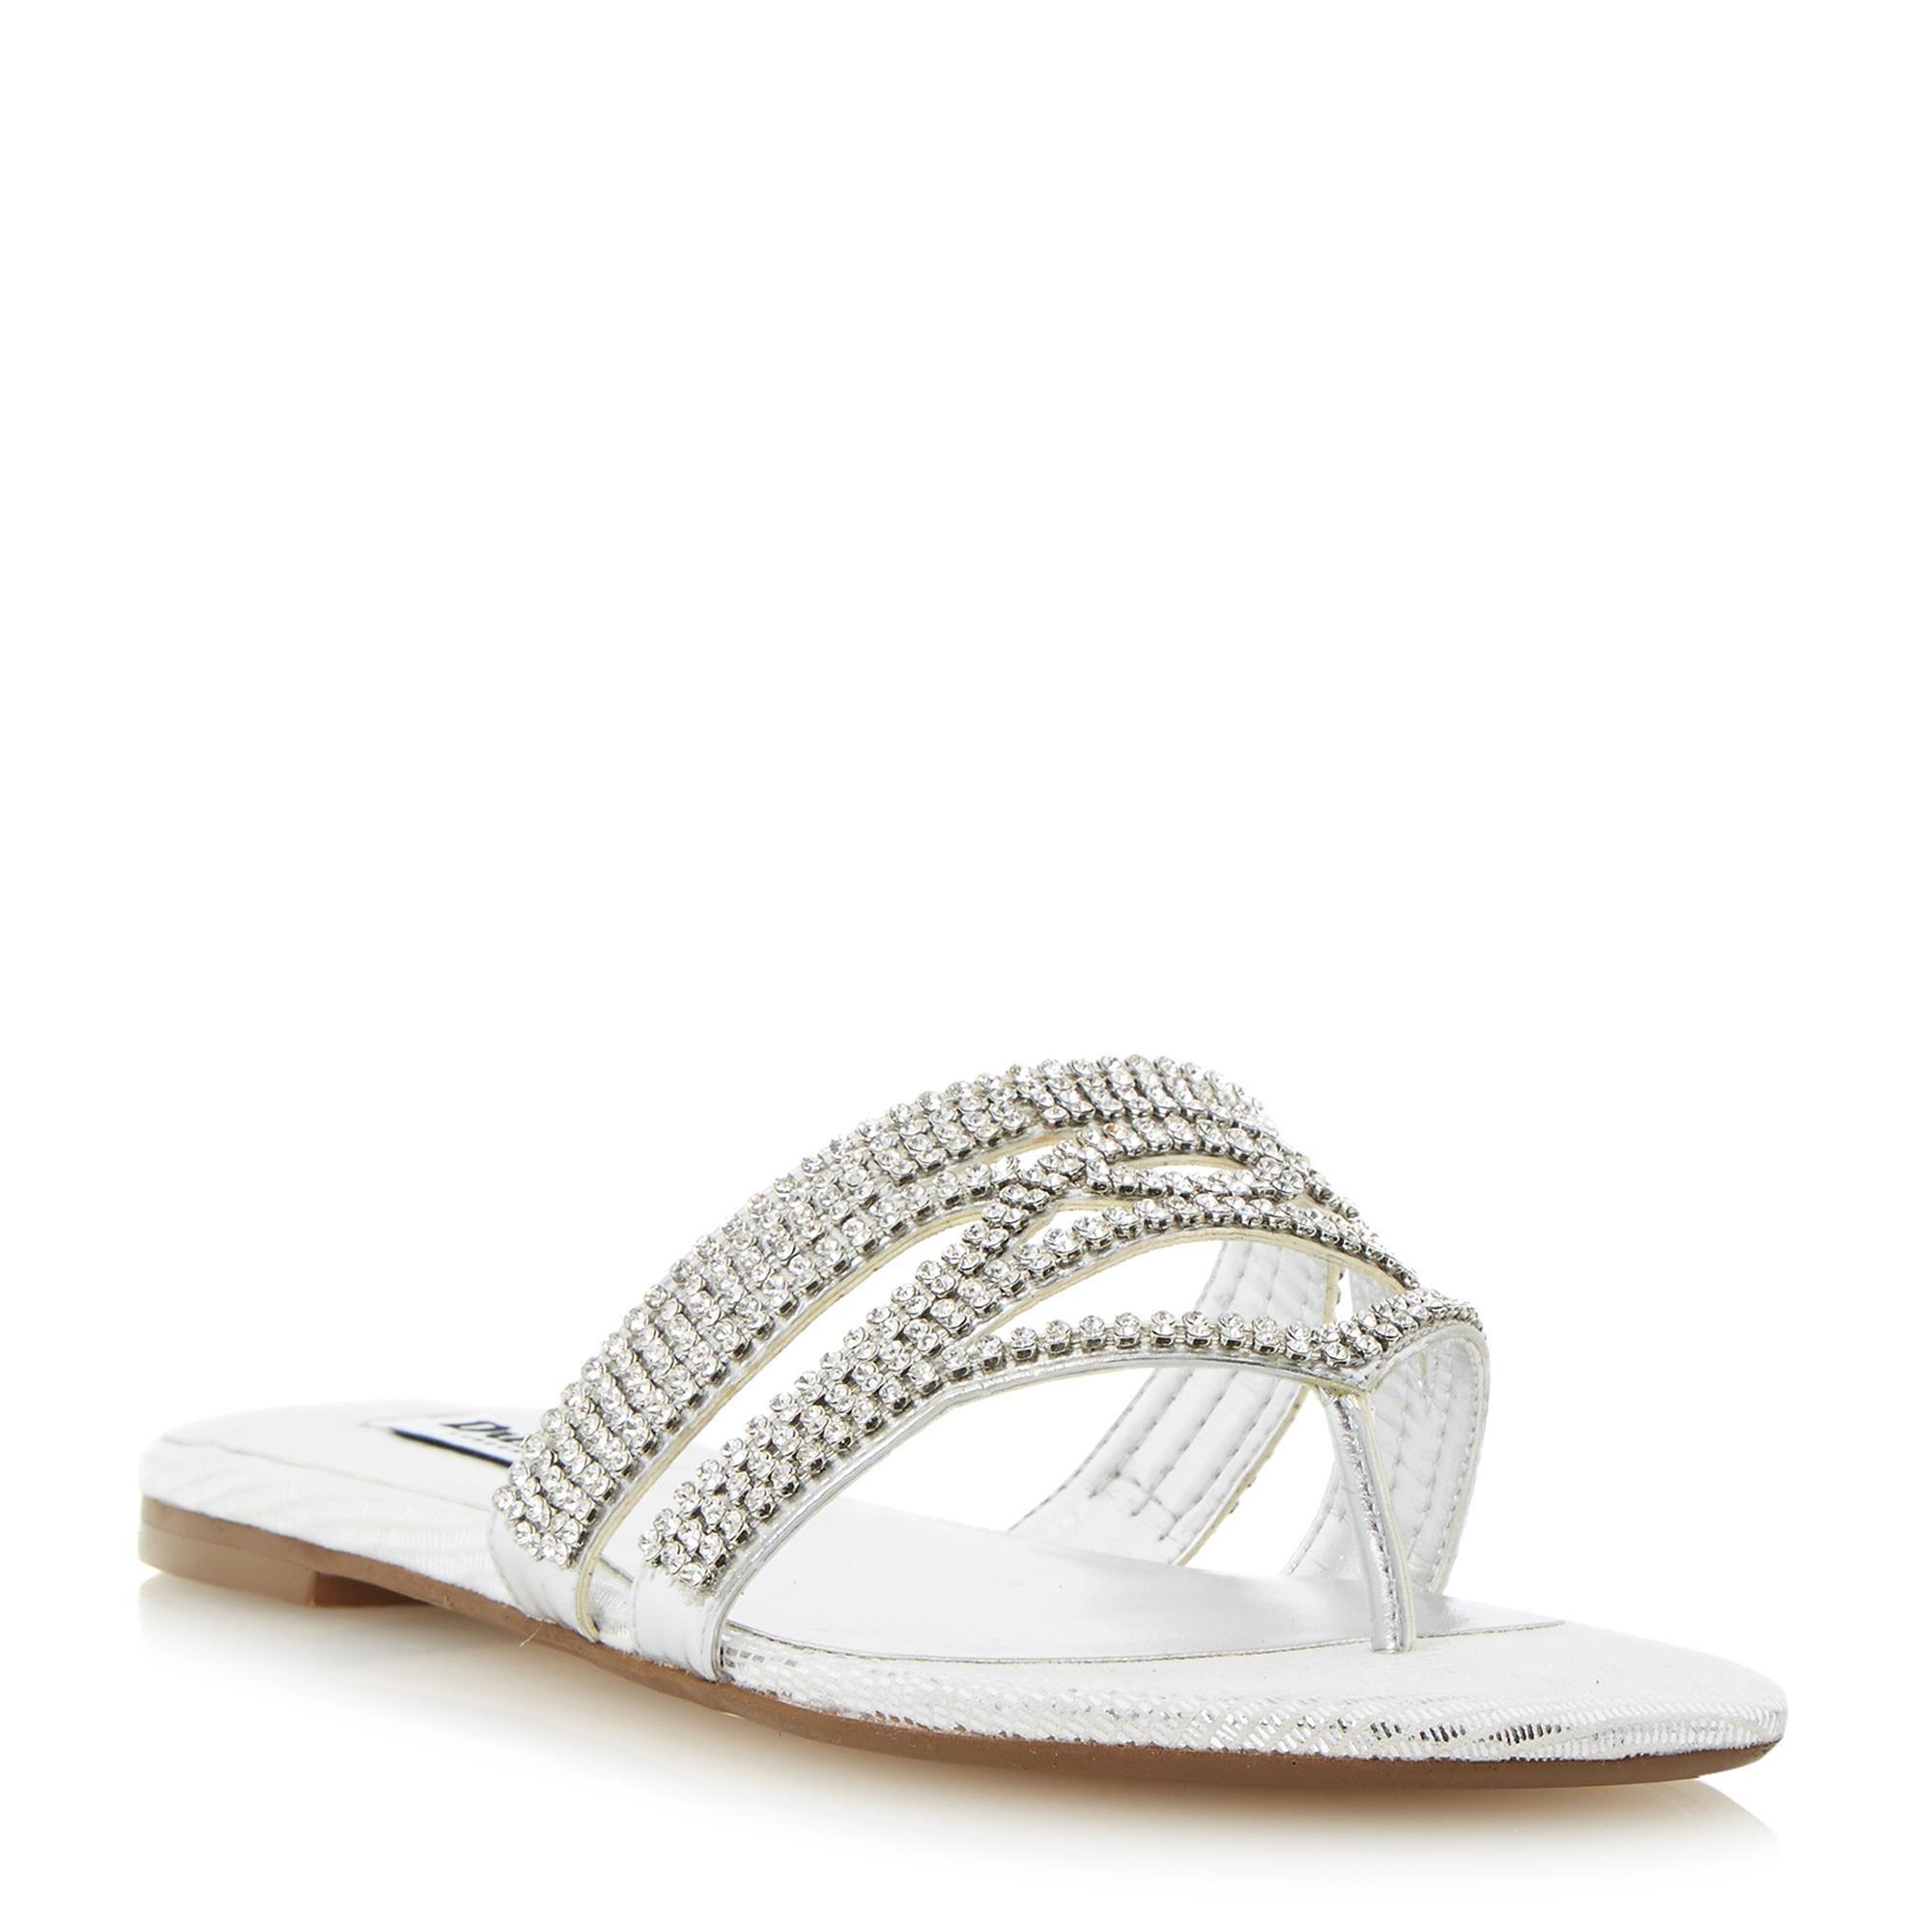 Embellished flats, Wedding shoes flats